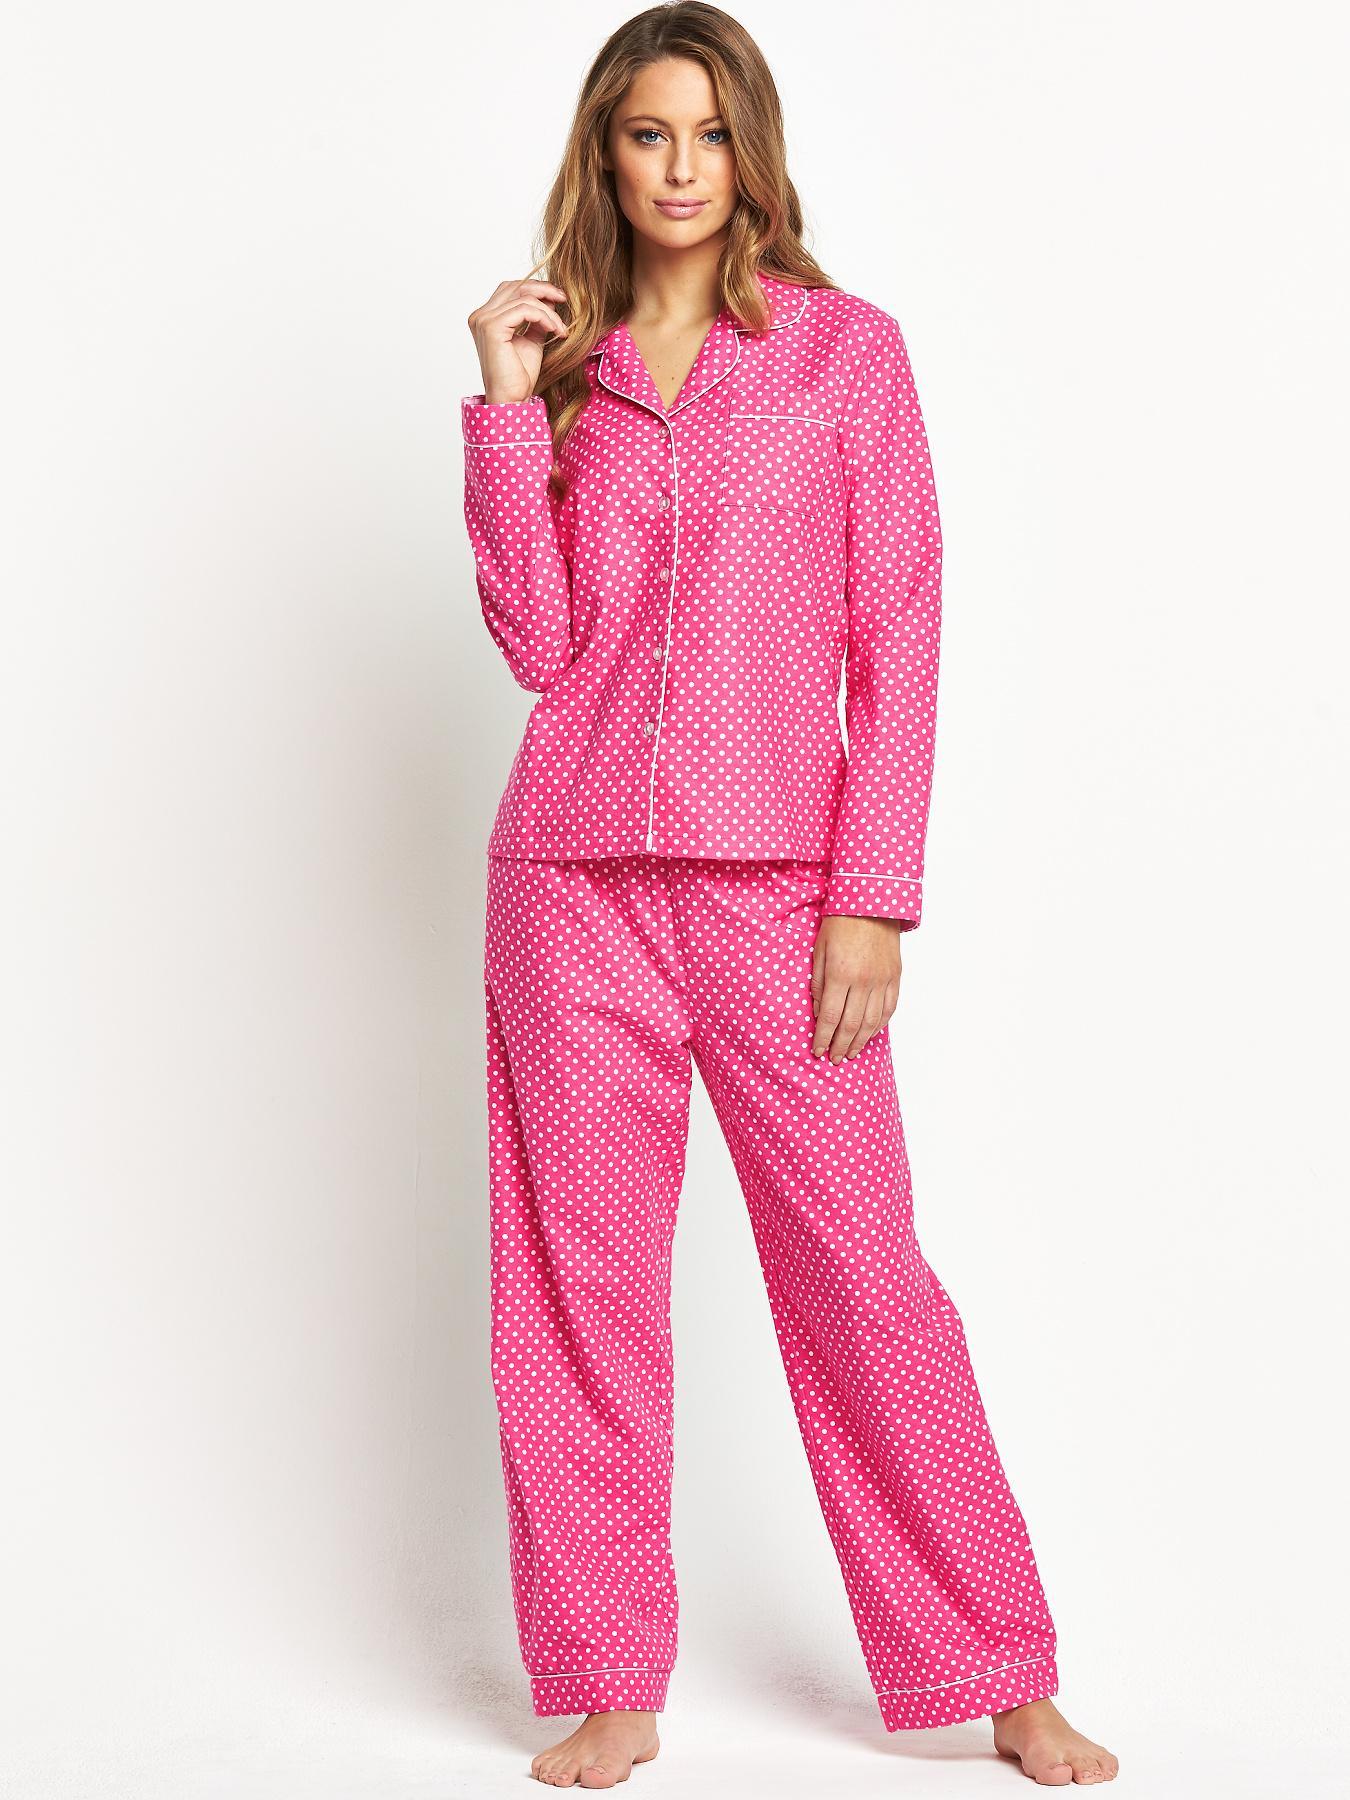 Sorbet Spring Spot Flannel Pyjamas - Pink, Pink